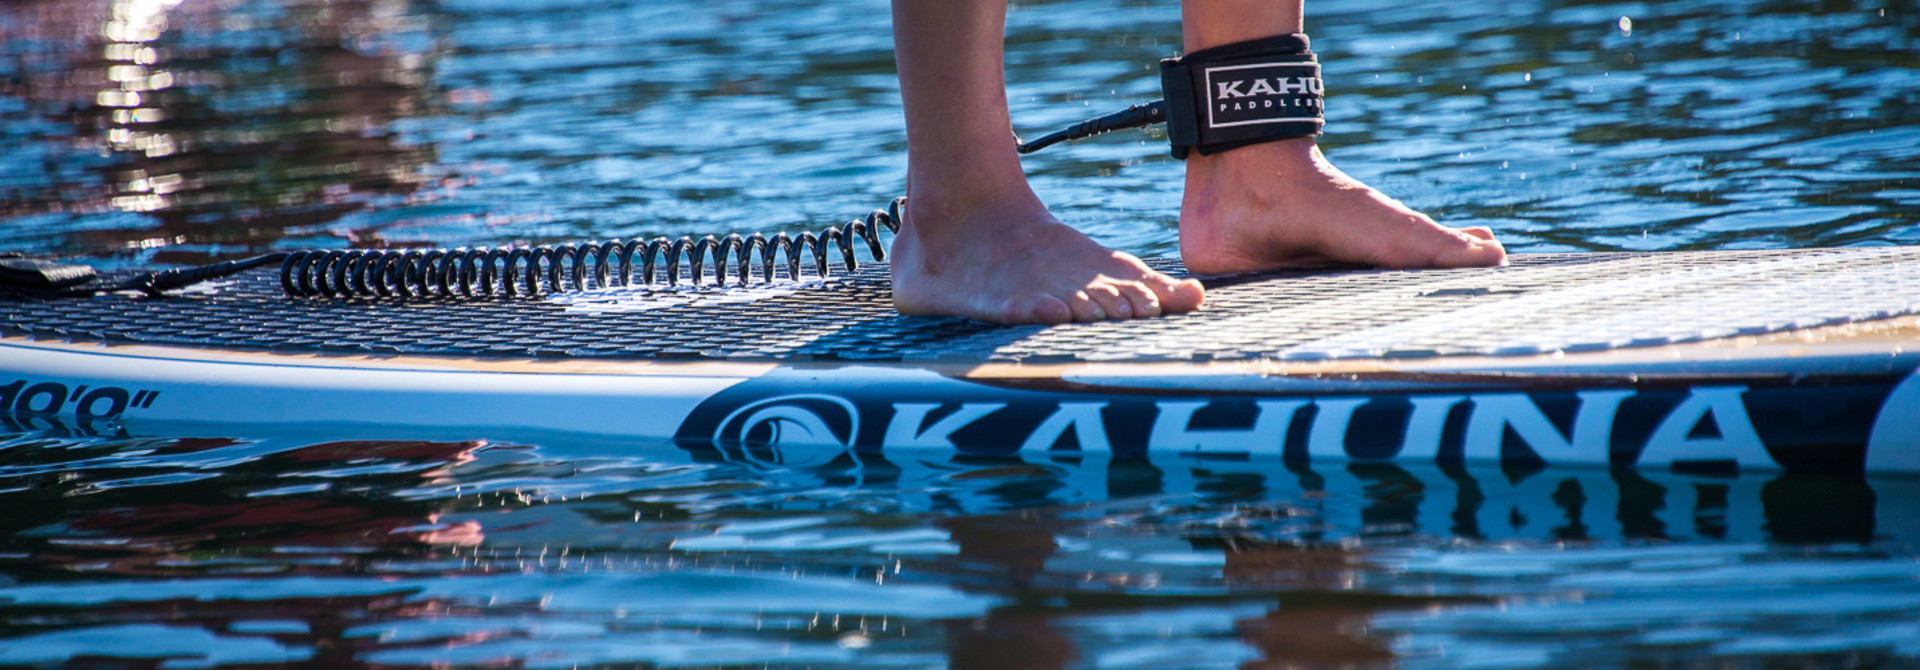 Standup Paddle